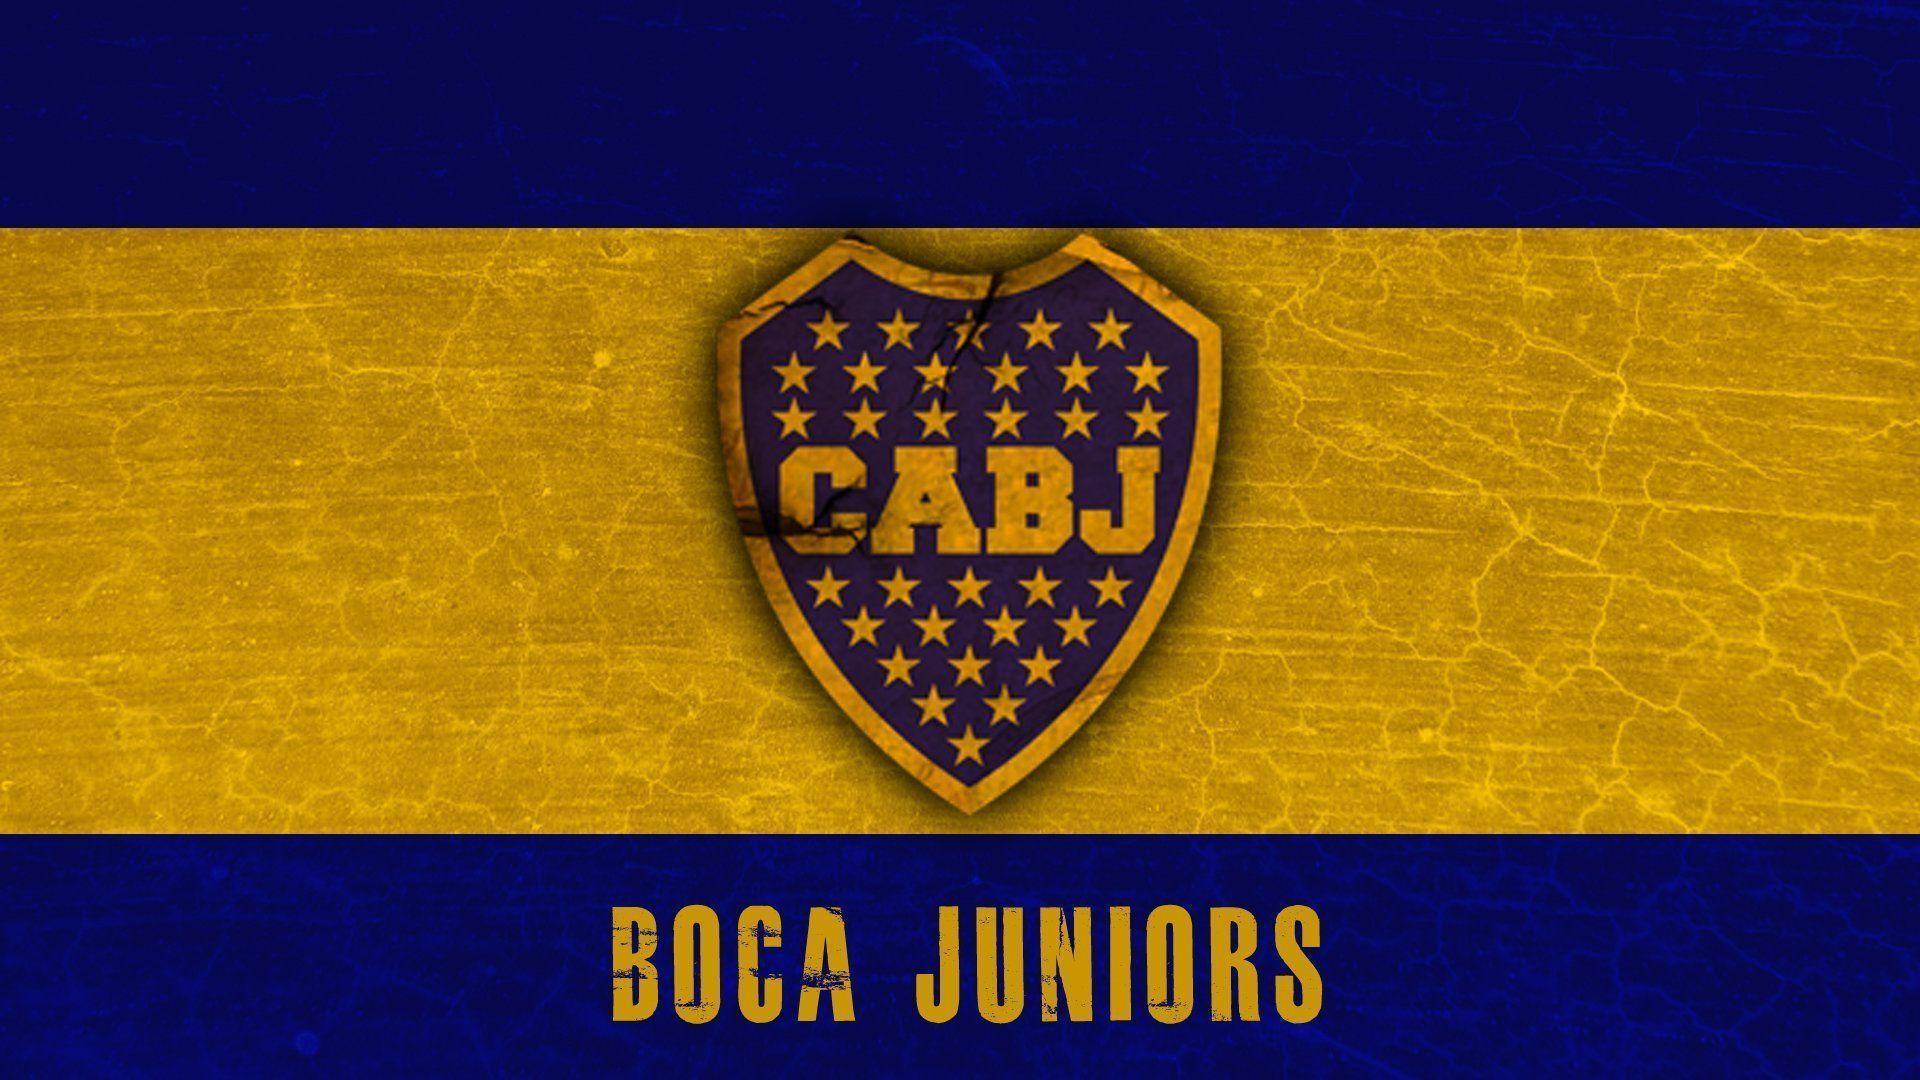 Boca Juniors HD Wallpapers 78 images 1920x1080